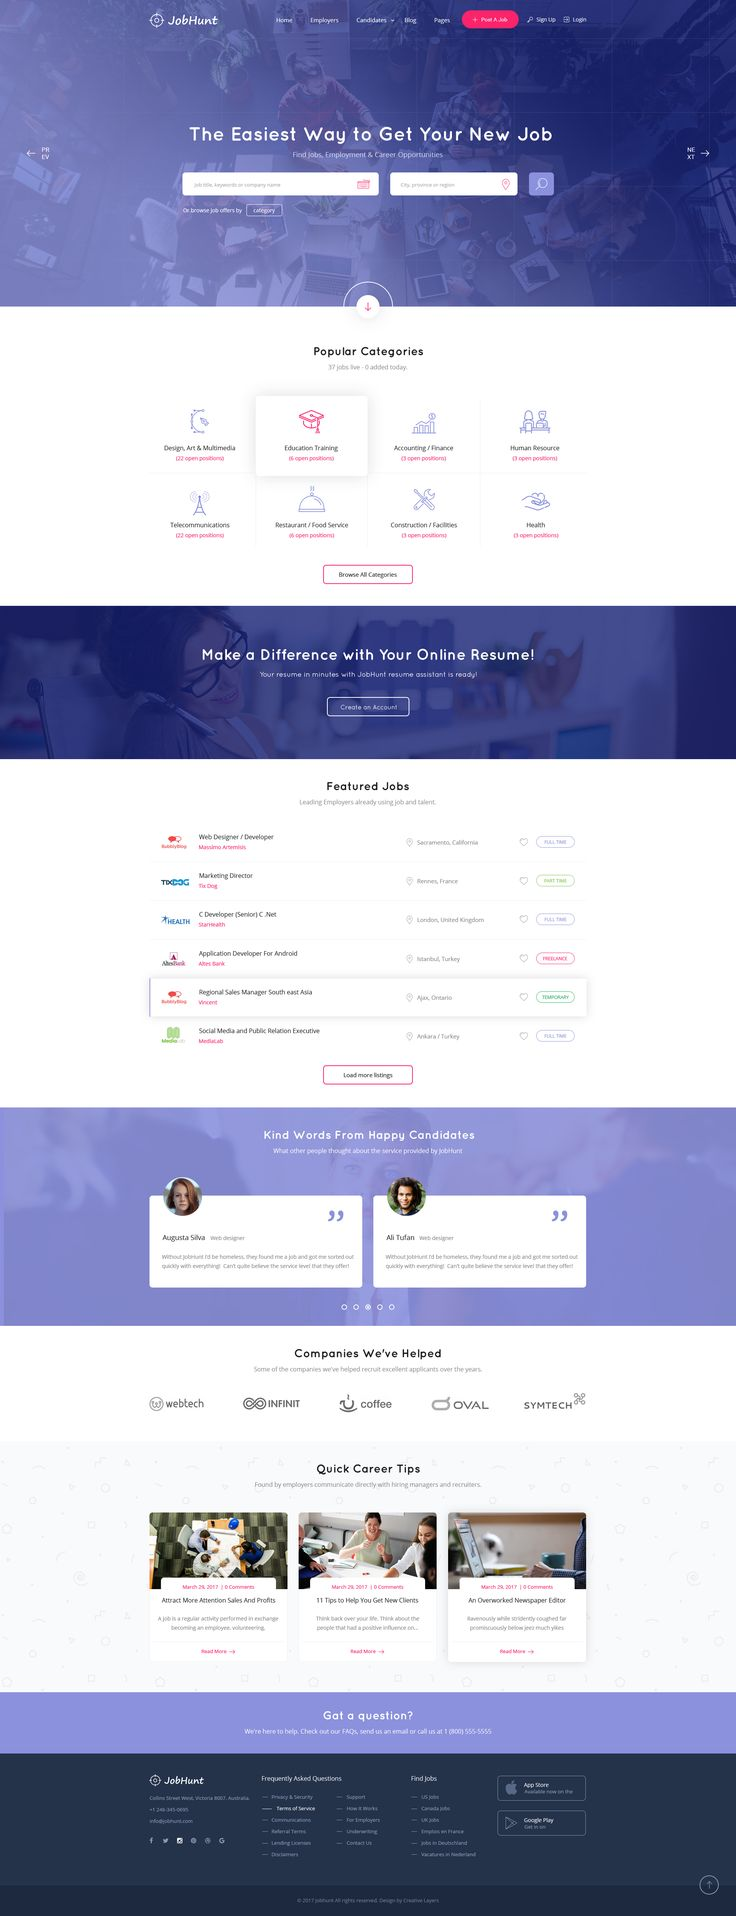 best 25 job portal ideas on pinterest job portal sites portal website and grid app. Black Bedroom Furniture Sets. Home Design Ideas